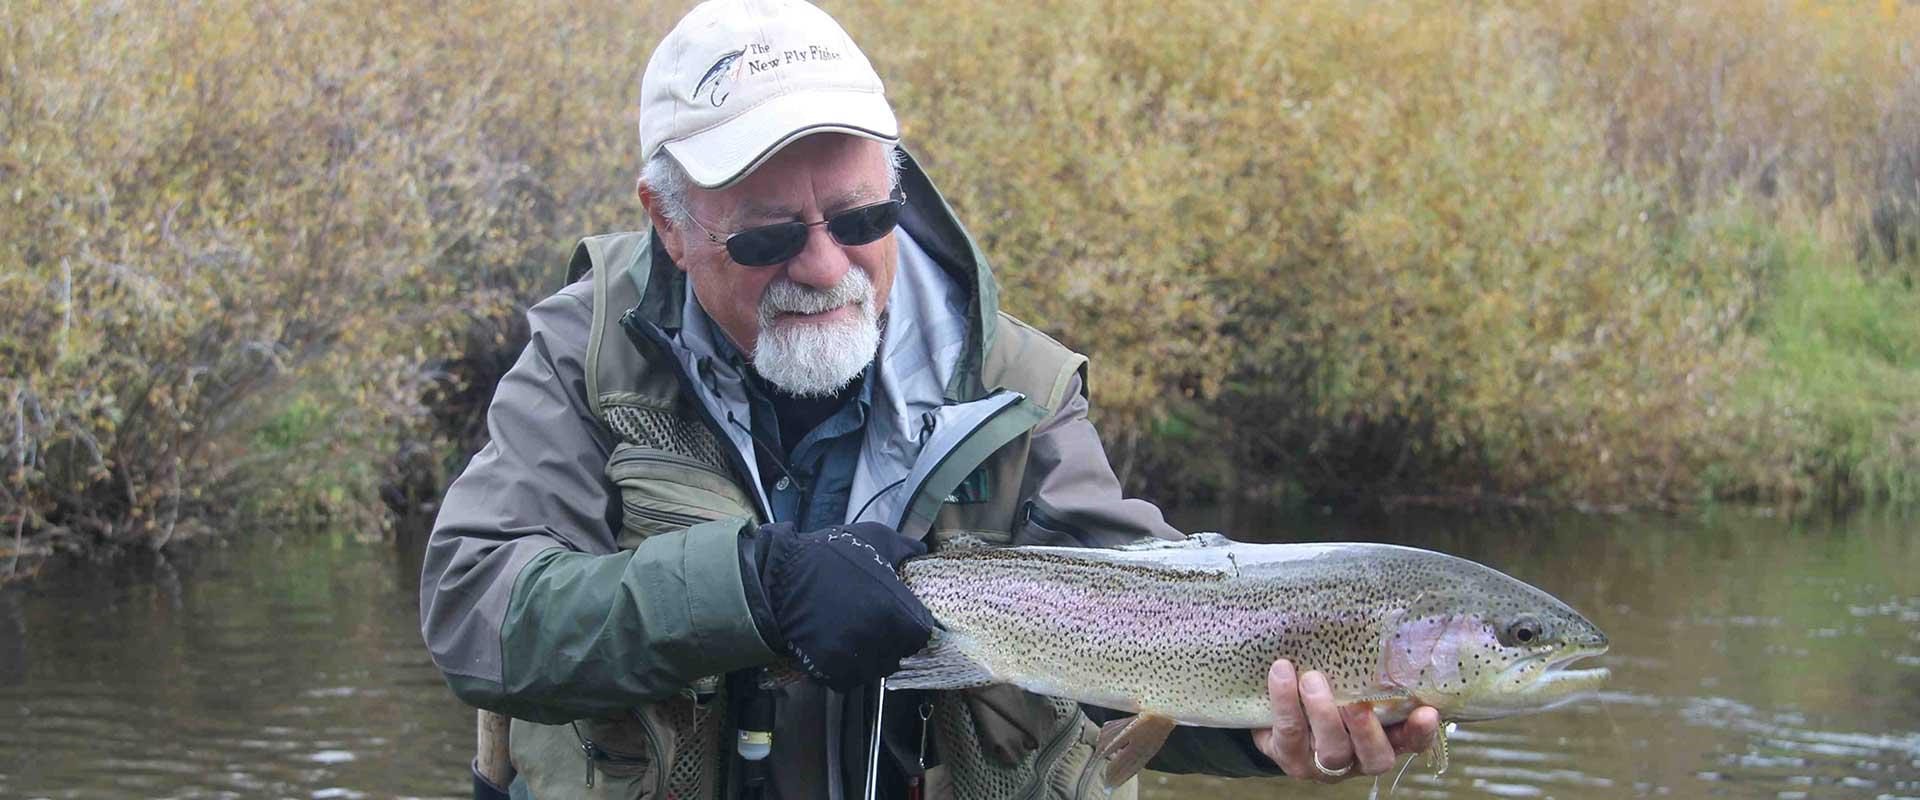 Big-Rawah-rainbow-new-fly-fisher